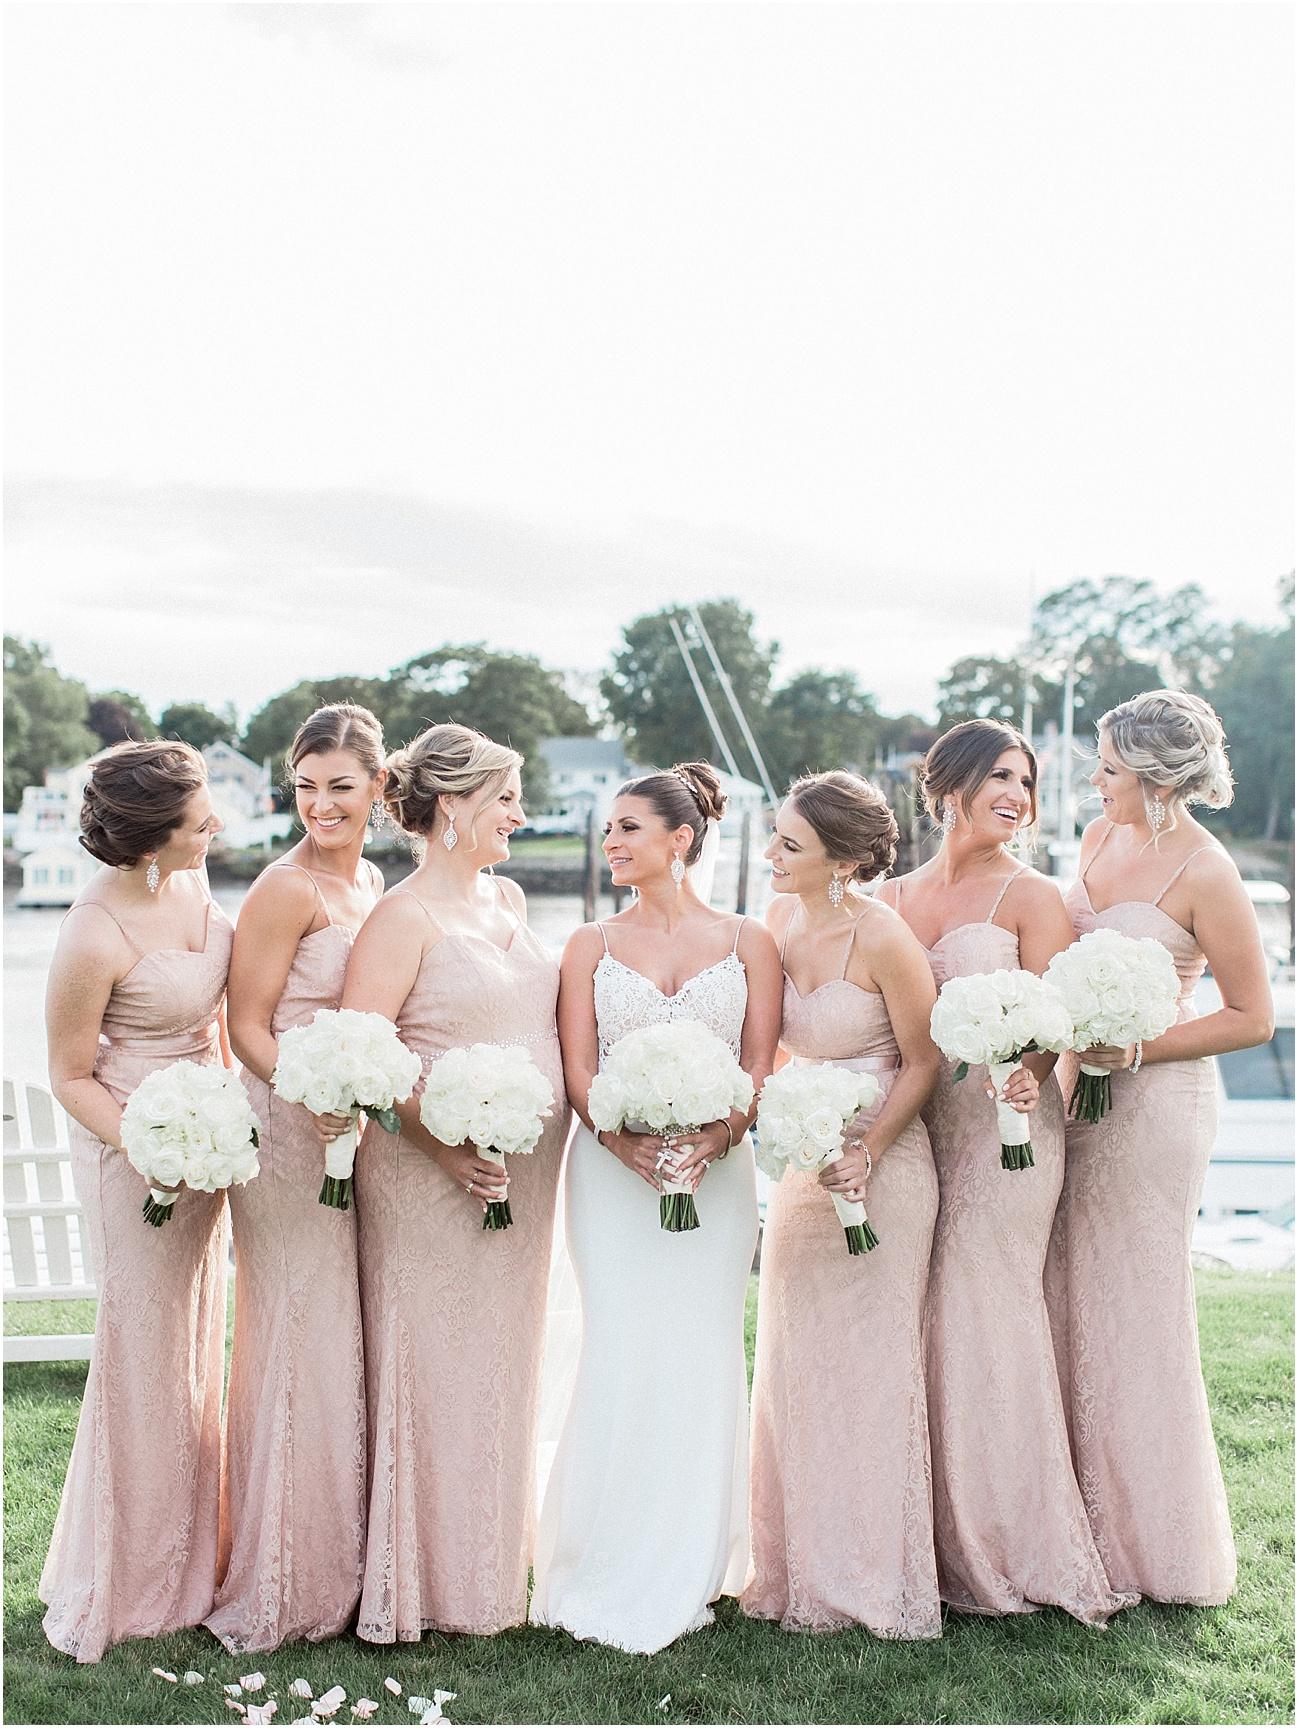 bianca_chris_danversport_italian_blush_gold_north_shore_cape_cod_boston_wedding_photographer_meredith_jane_photography_photo_1122.jpg